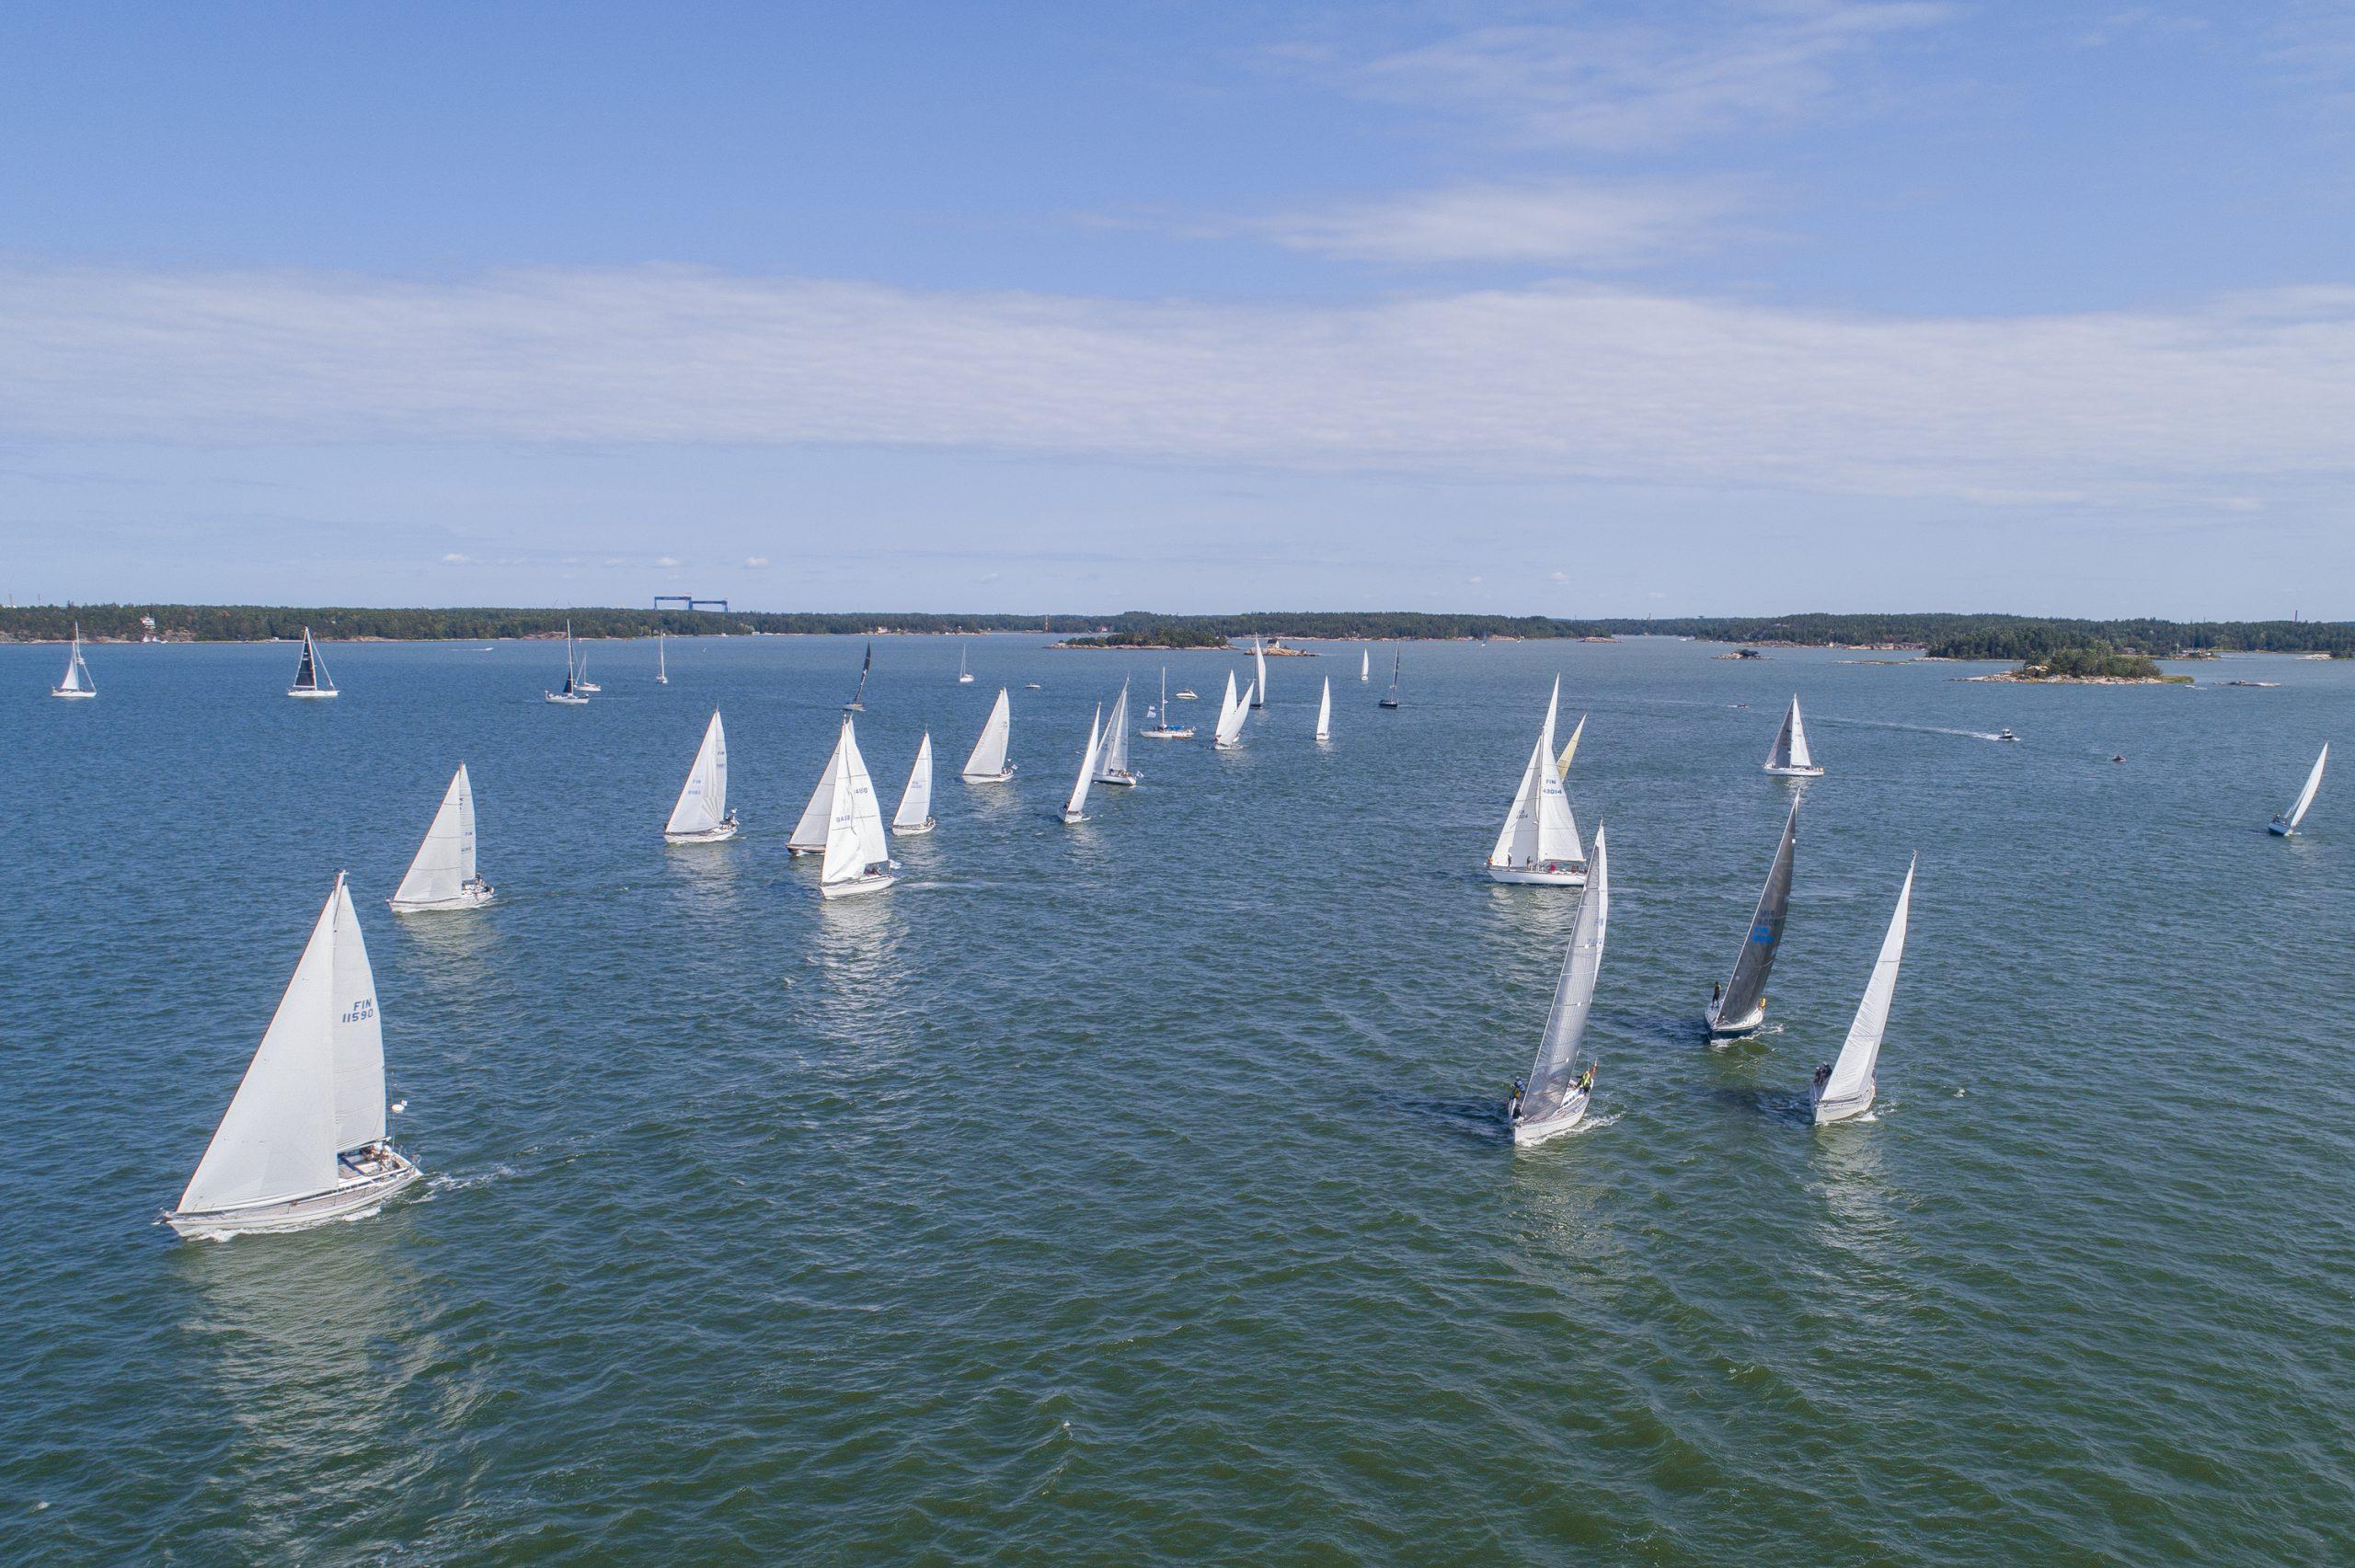 Aerial view of yacht fleet